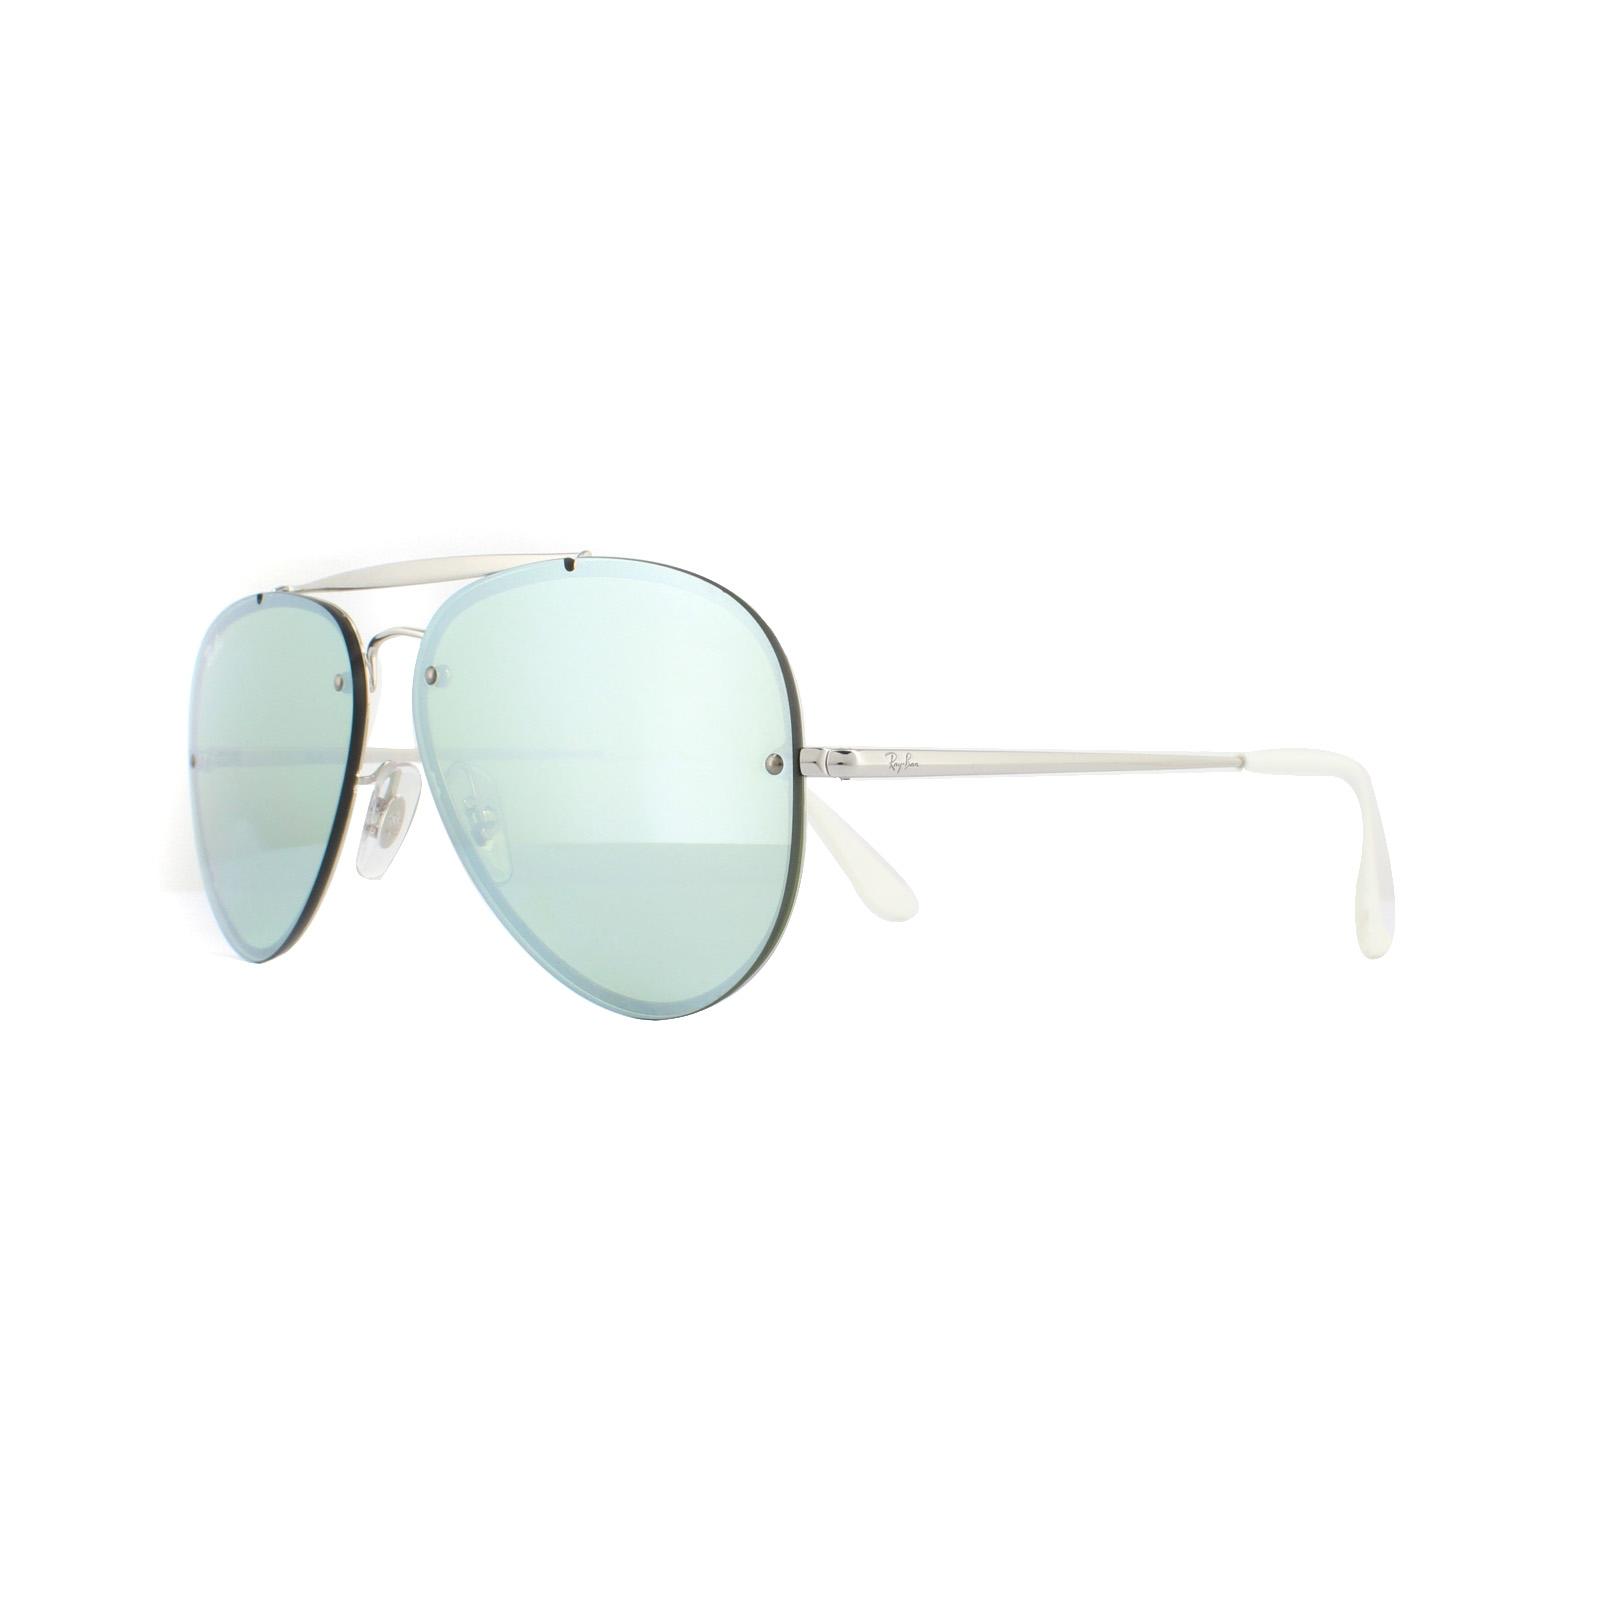 dda0f02fa Sentinel Ray-Ban Sunglasses Blaze Aviator 3584N 905130 Silver Dark Green  Silver Mirror